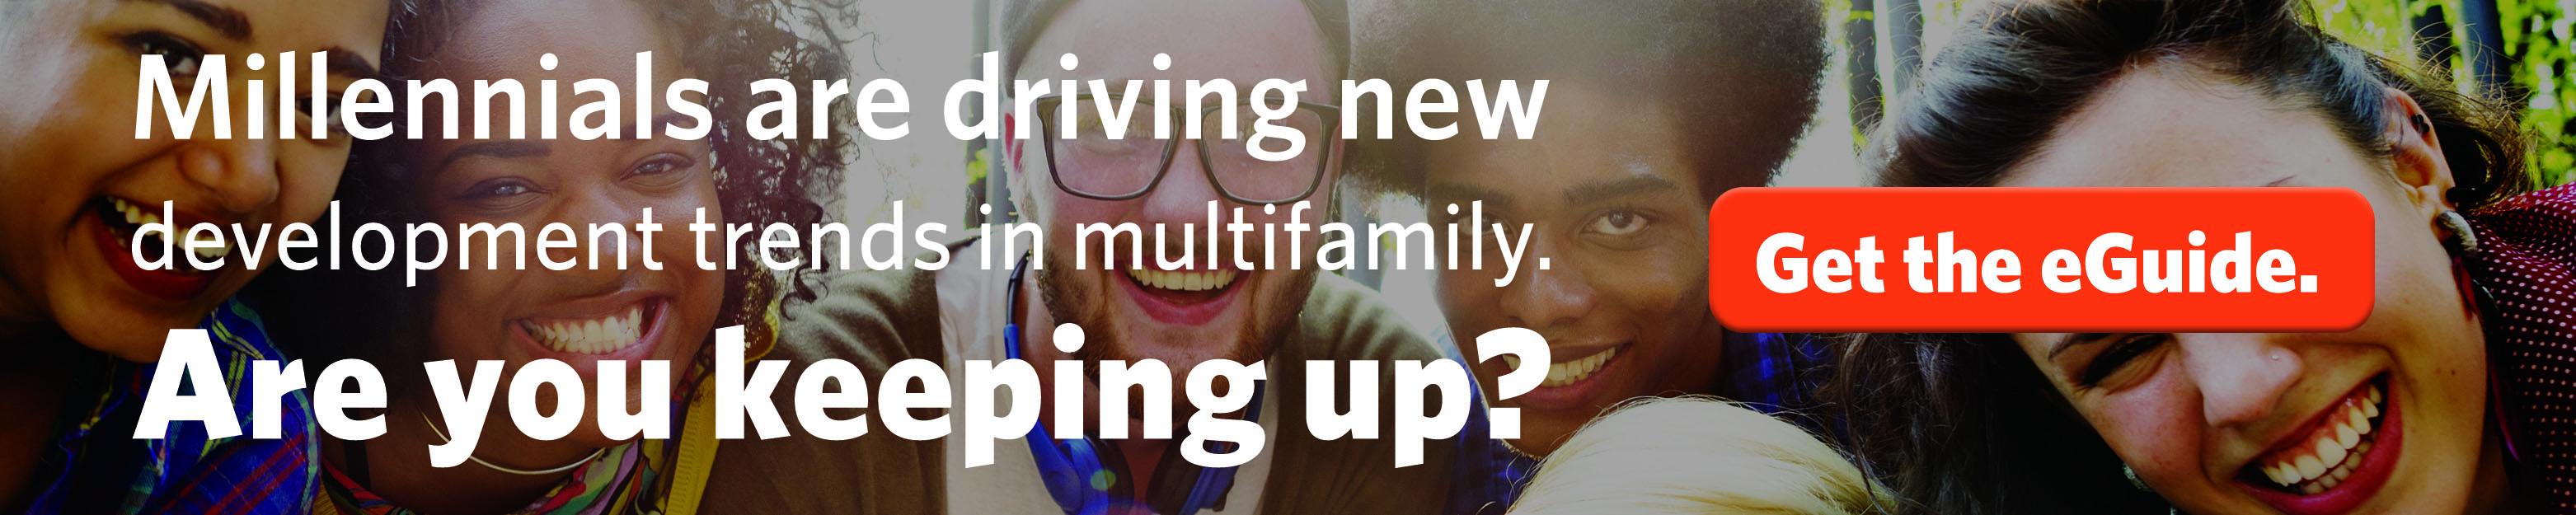 millennial-multifamily-development-trends-cta-photo